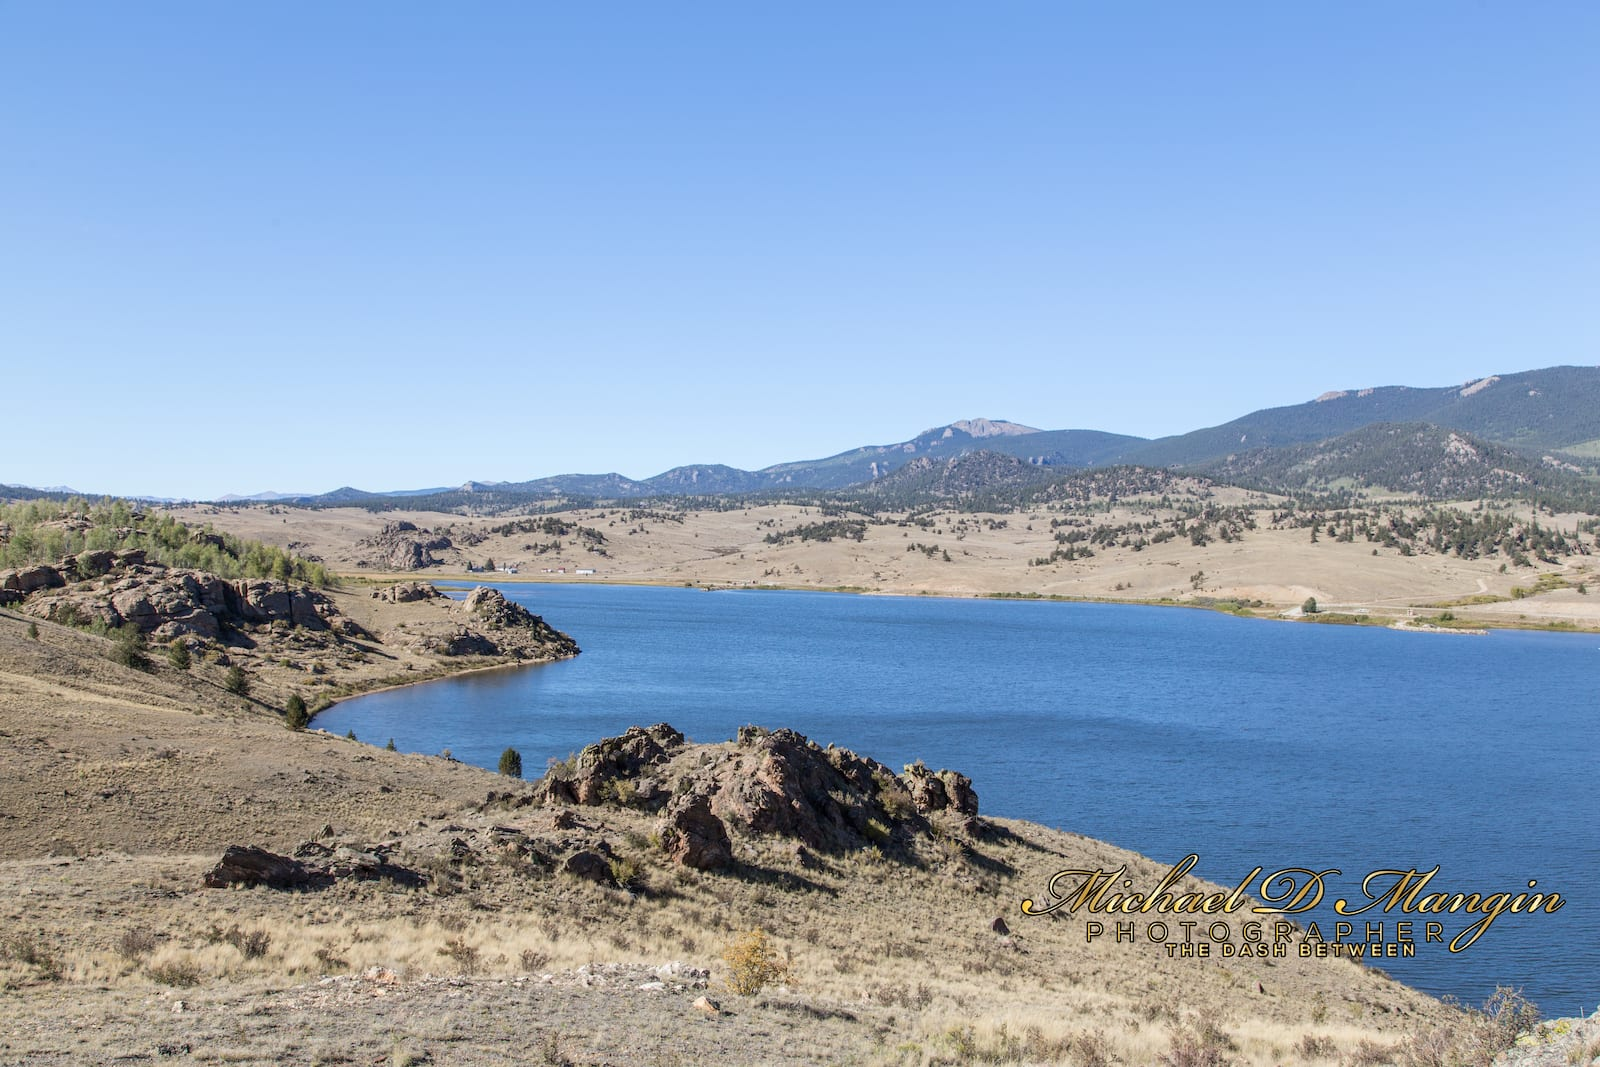 Tarryall Reservoir Colorado